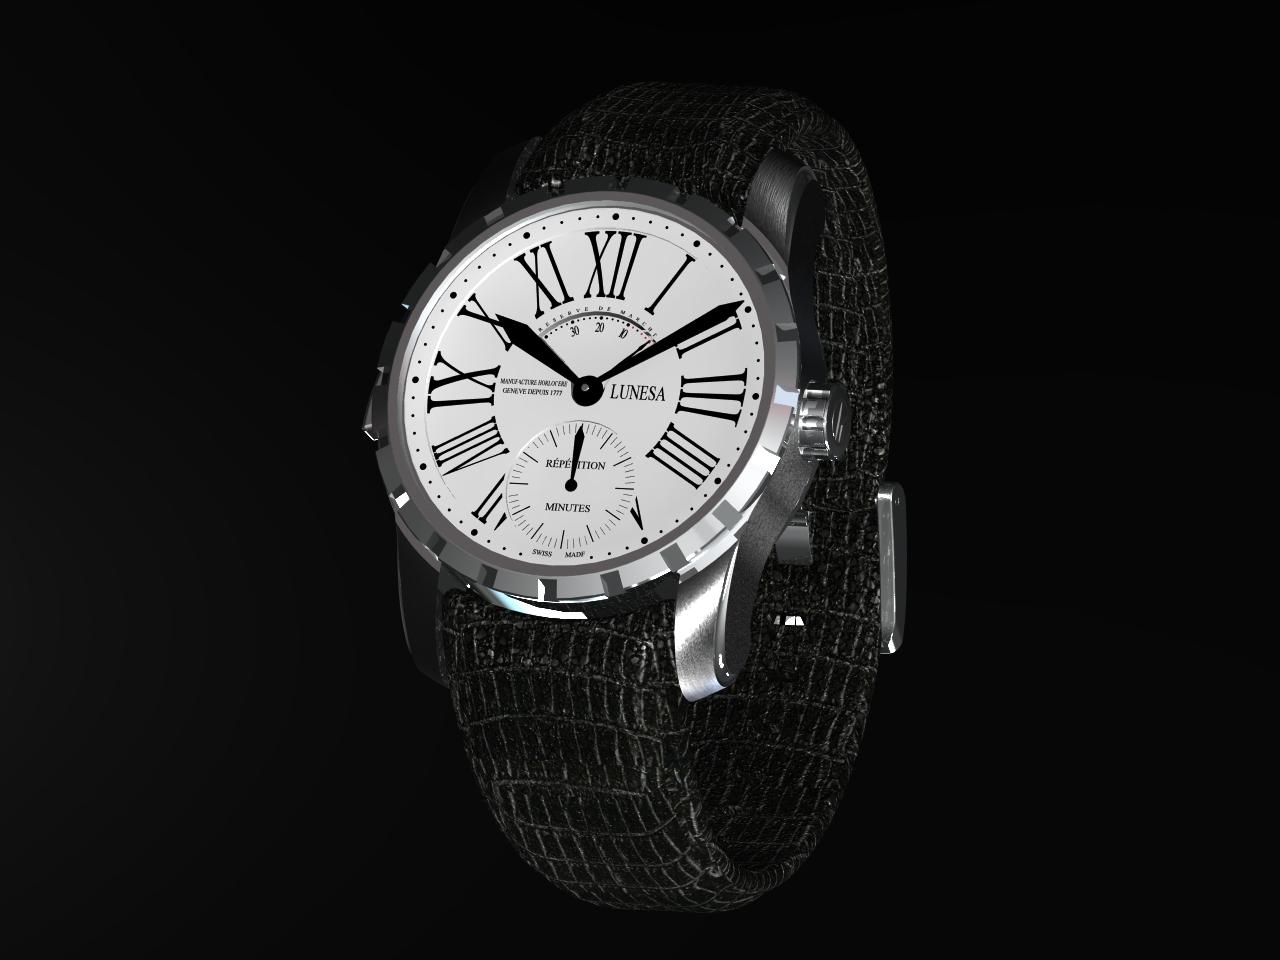 часы Lunesa  MINUTES REPEATER